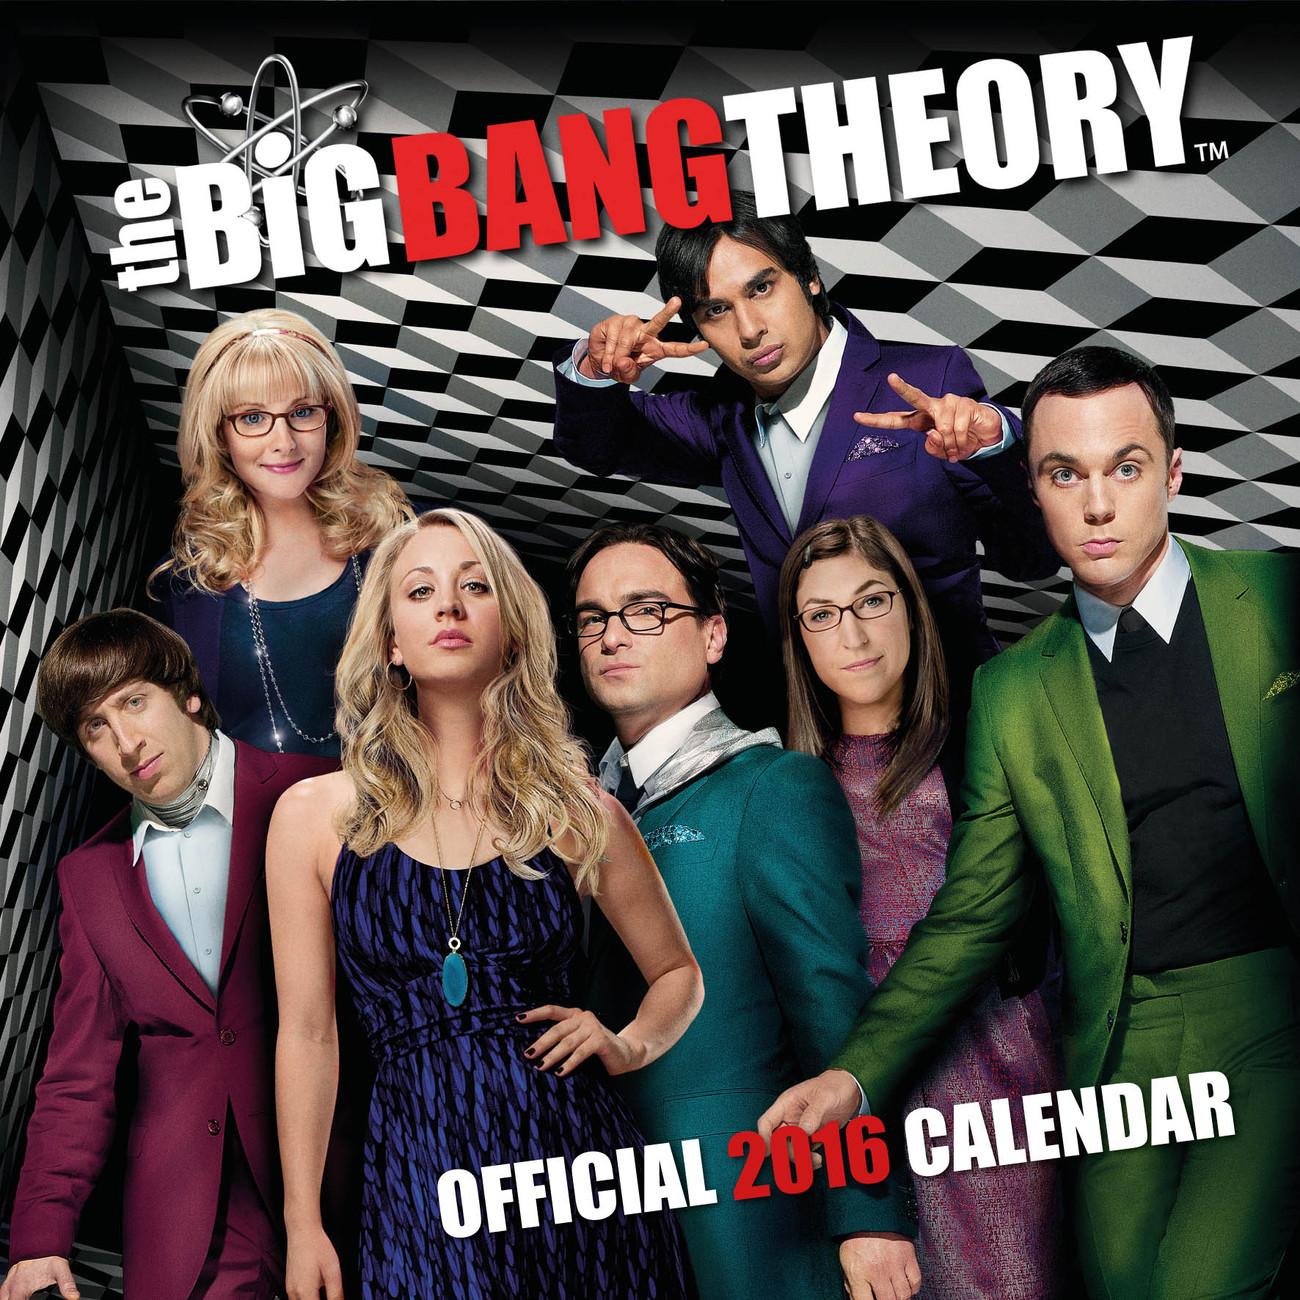 Bestel Een The Big Bang Theory Kalender 2019 Op Europostersnl